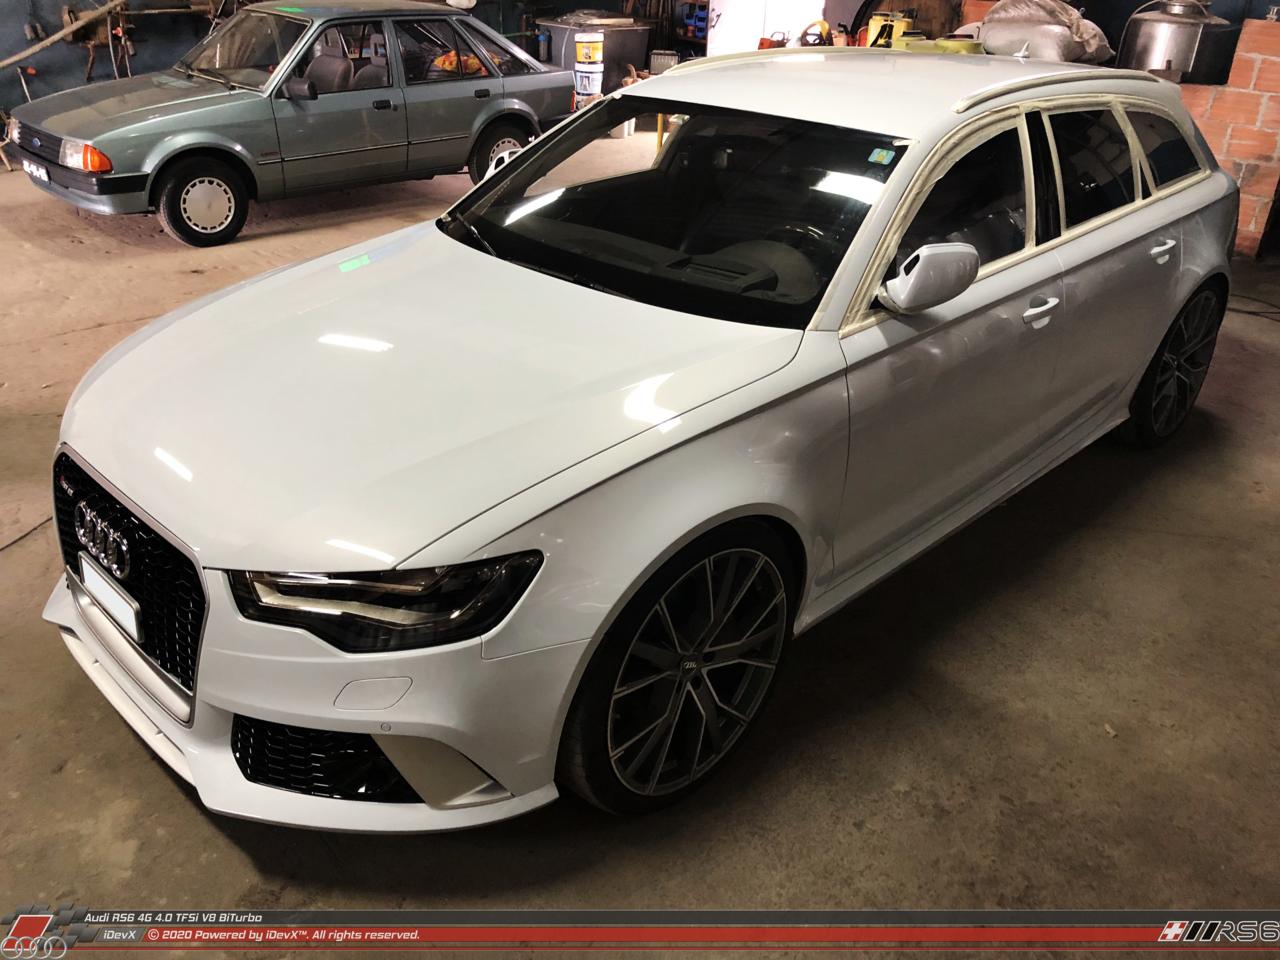 05_08.2019_Audi-RS6_iDevX_020.png